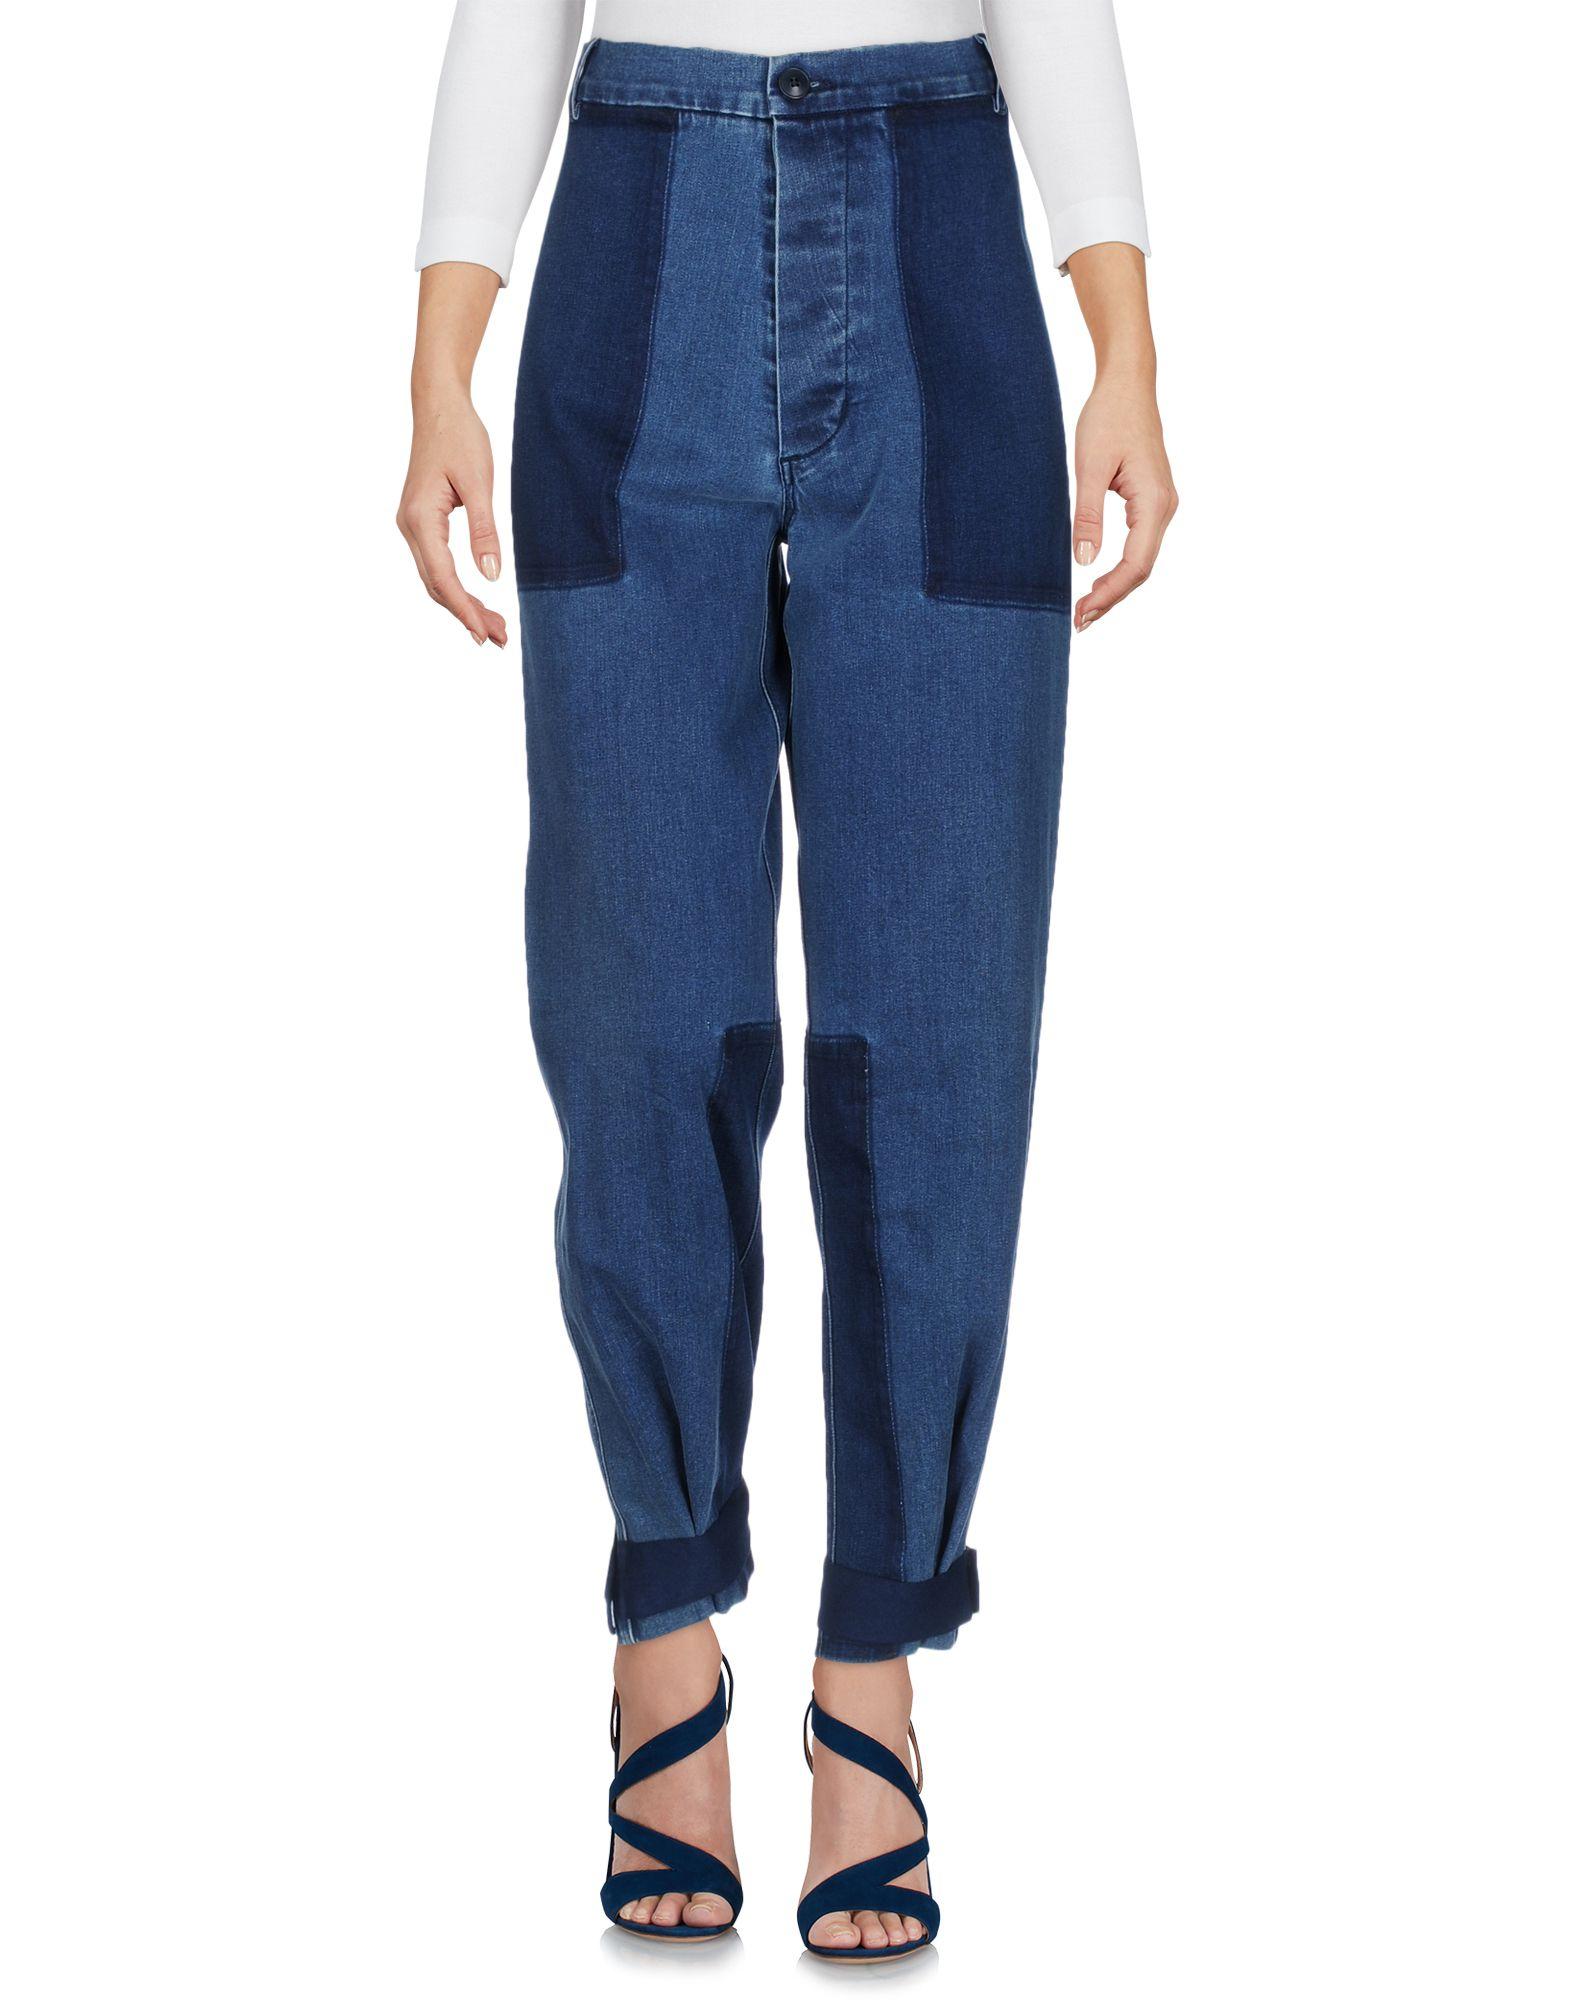 BAND OF OUTSIDERS Damen Jeanshose Farbe Blau Größe 2